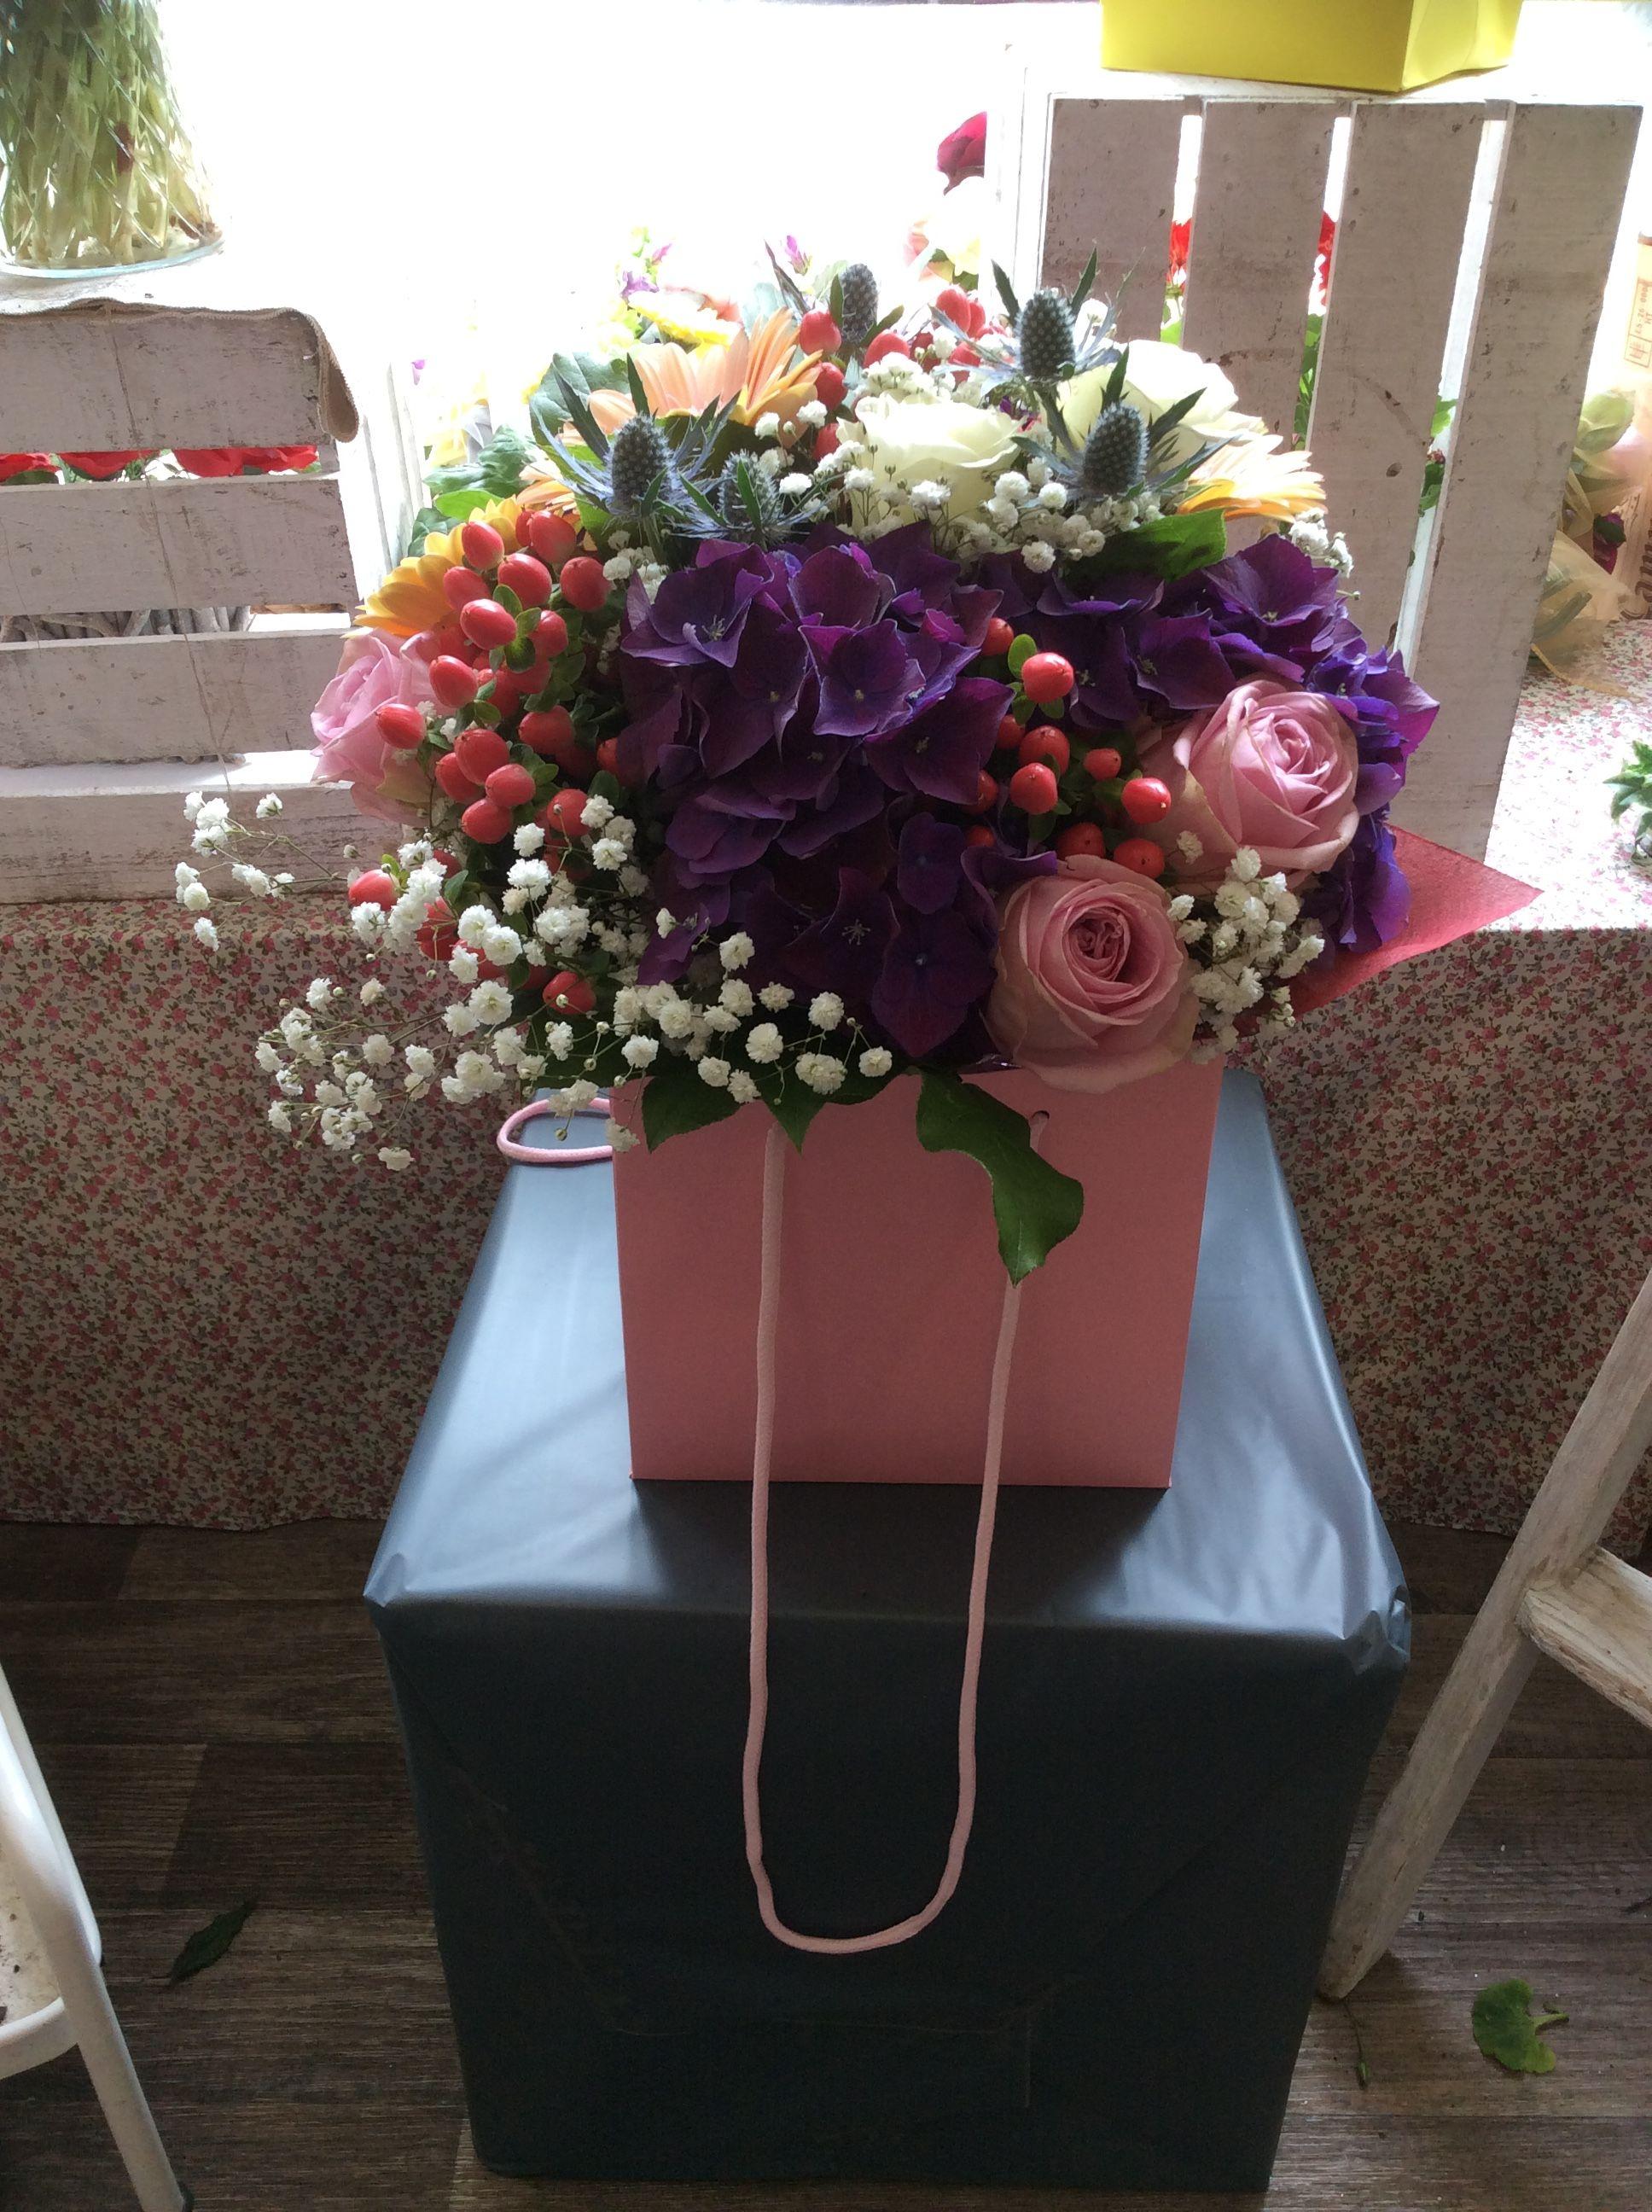 Hydrangea Bouquet Flower Delivery Same Day Flower Delivery Large Flower Arrangements